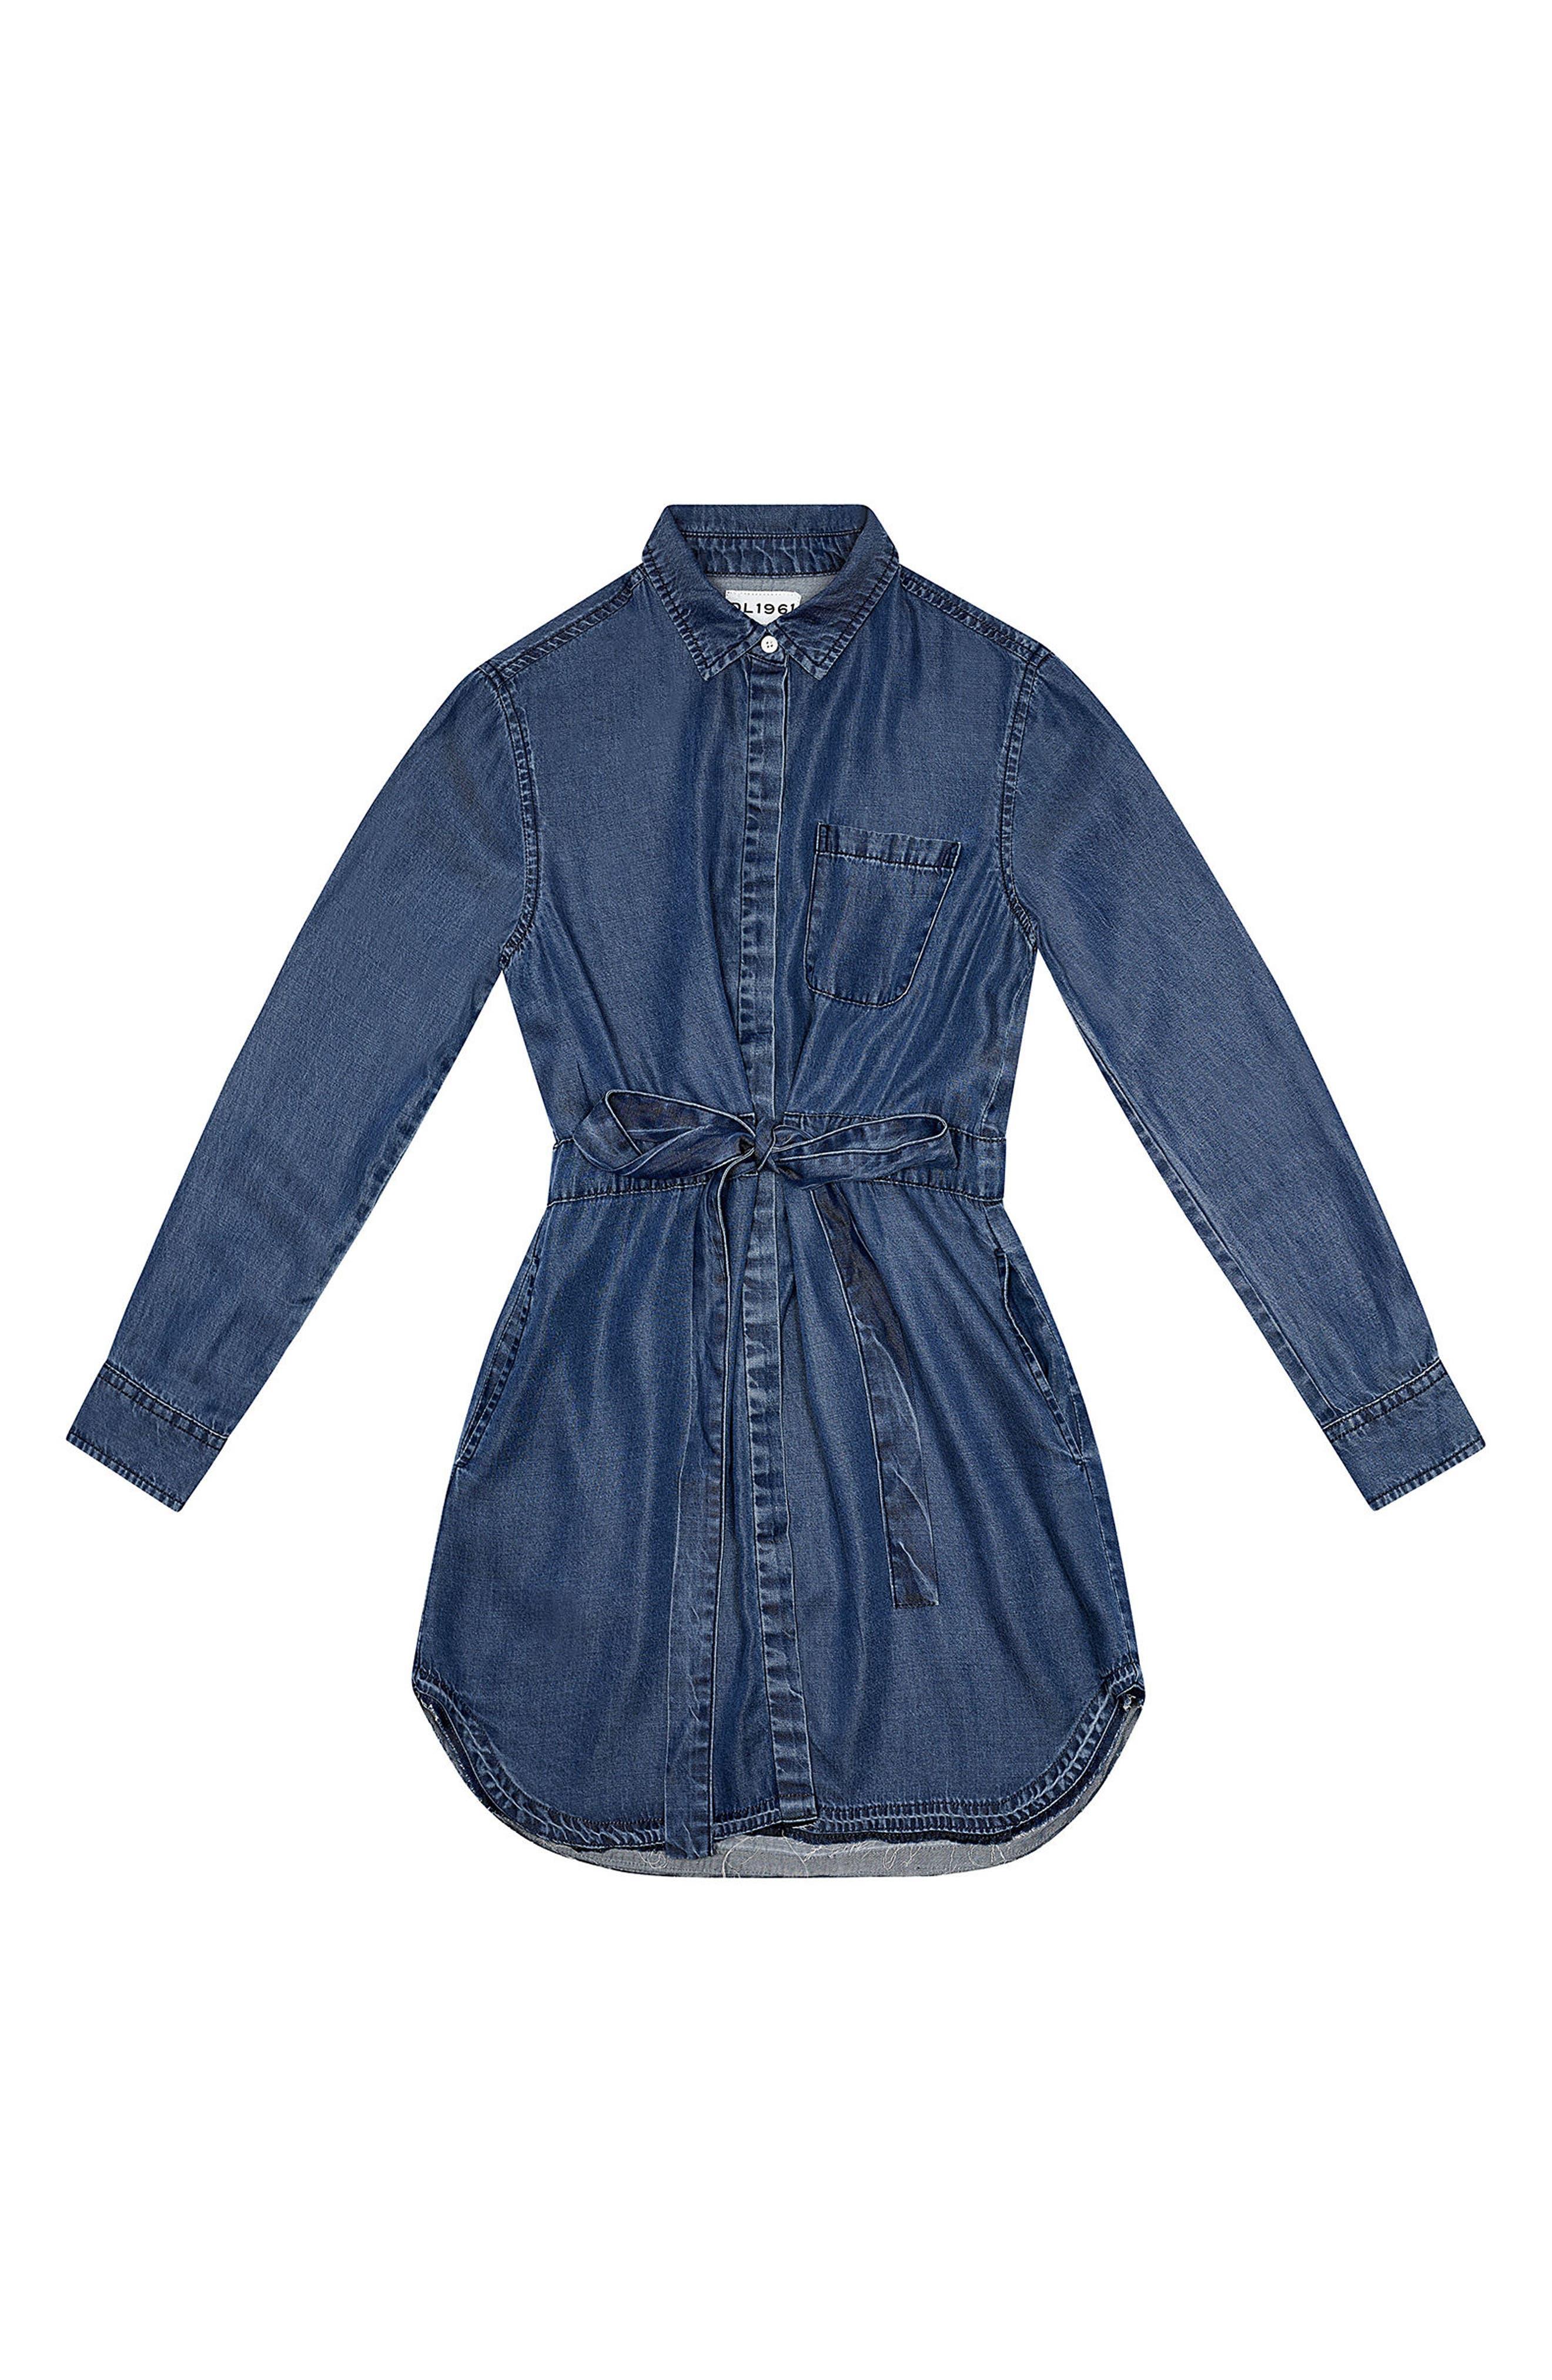 DL1961 Chambray Shirtdress (Big Girls)